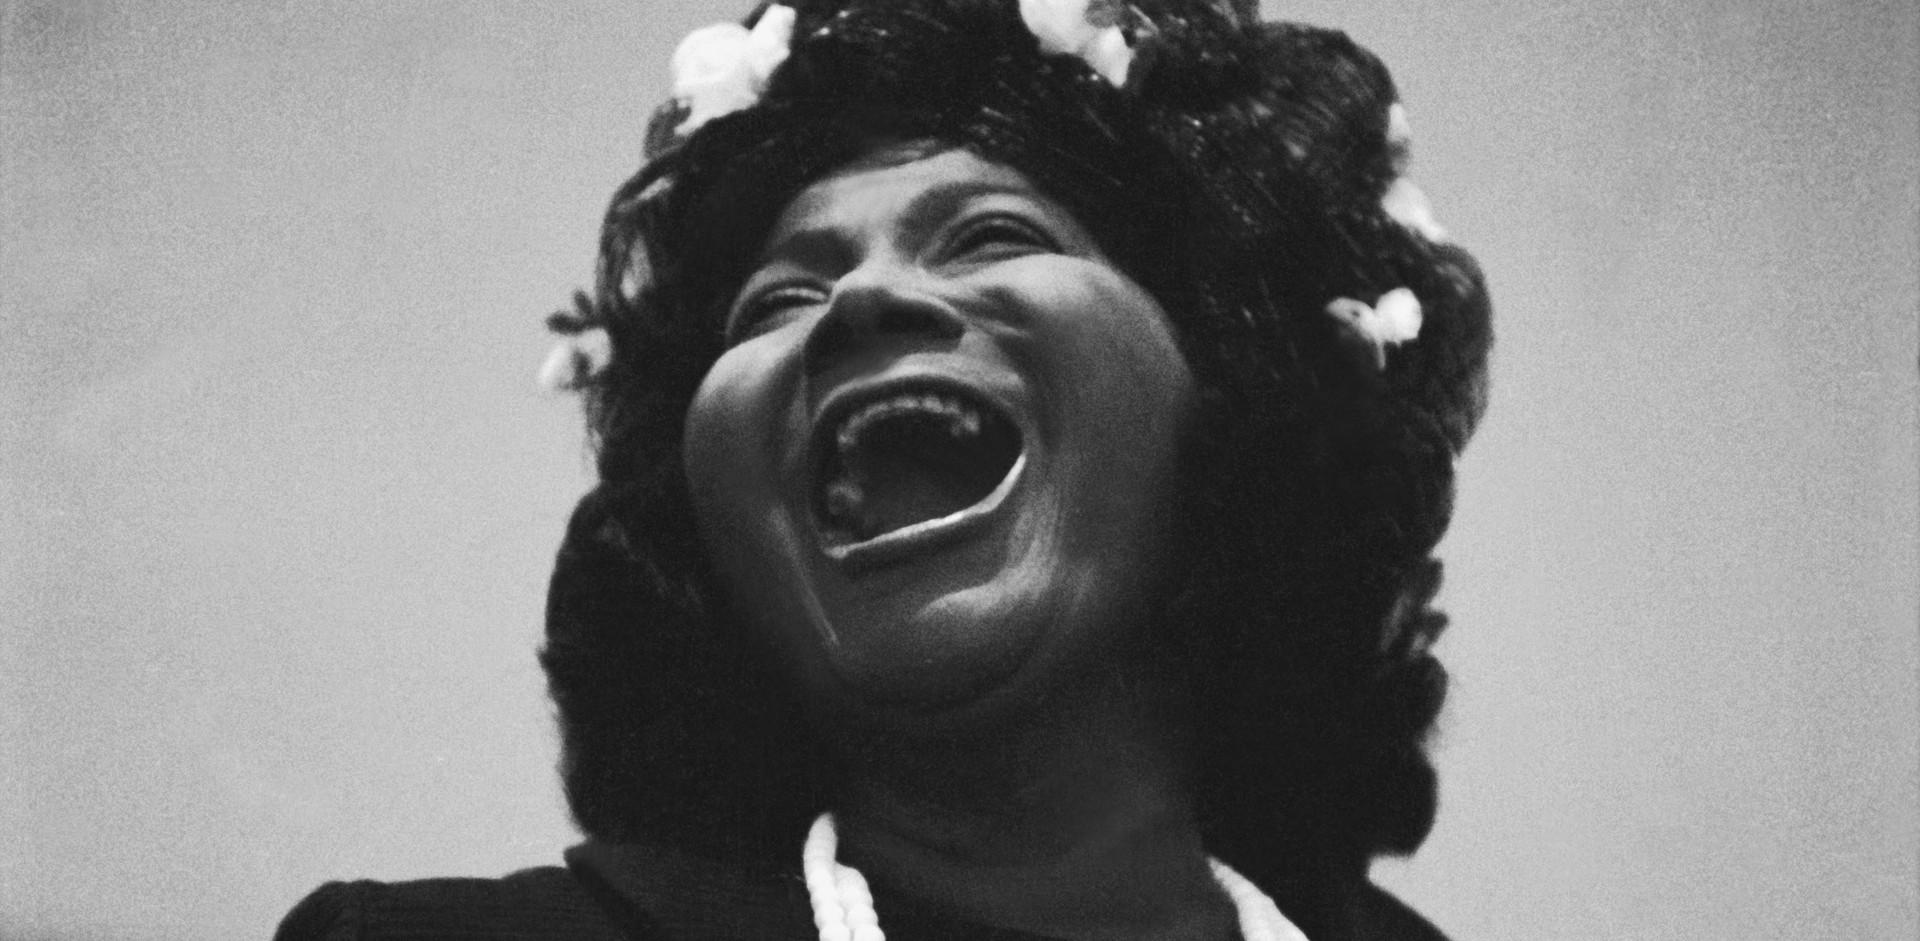 The gospel singer Mahalia Jackson sang during the memorial service for Martin Luther King Jr. in 1968.